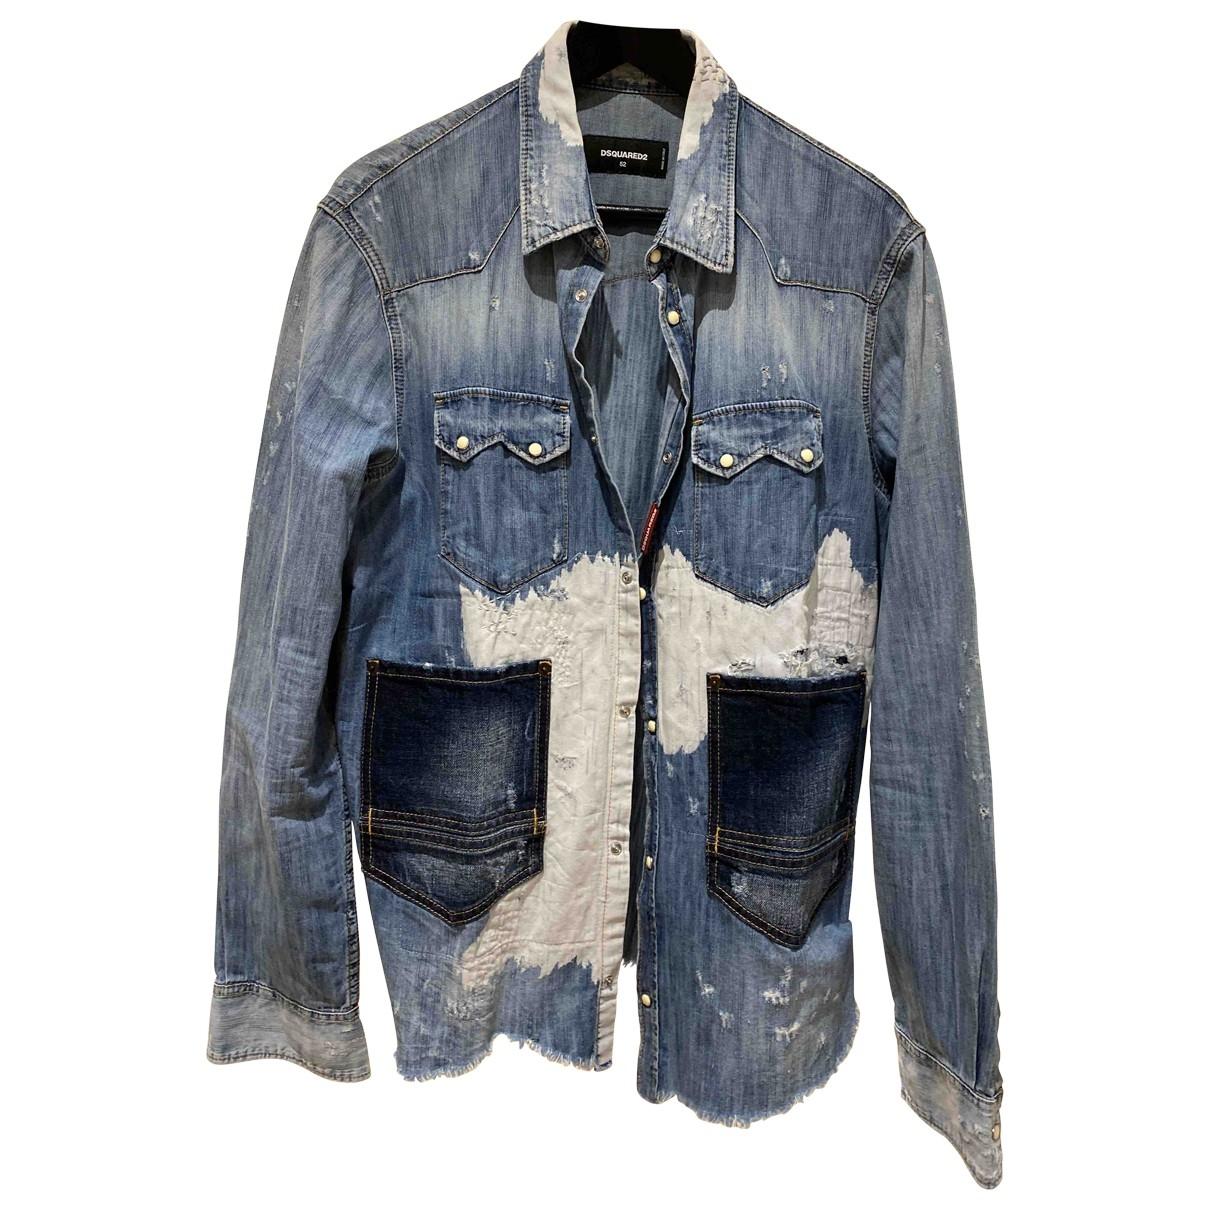 Dsquared2 \N Hemden in  Blau Denim - Jeans